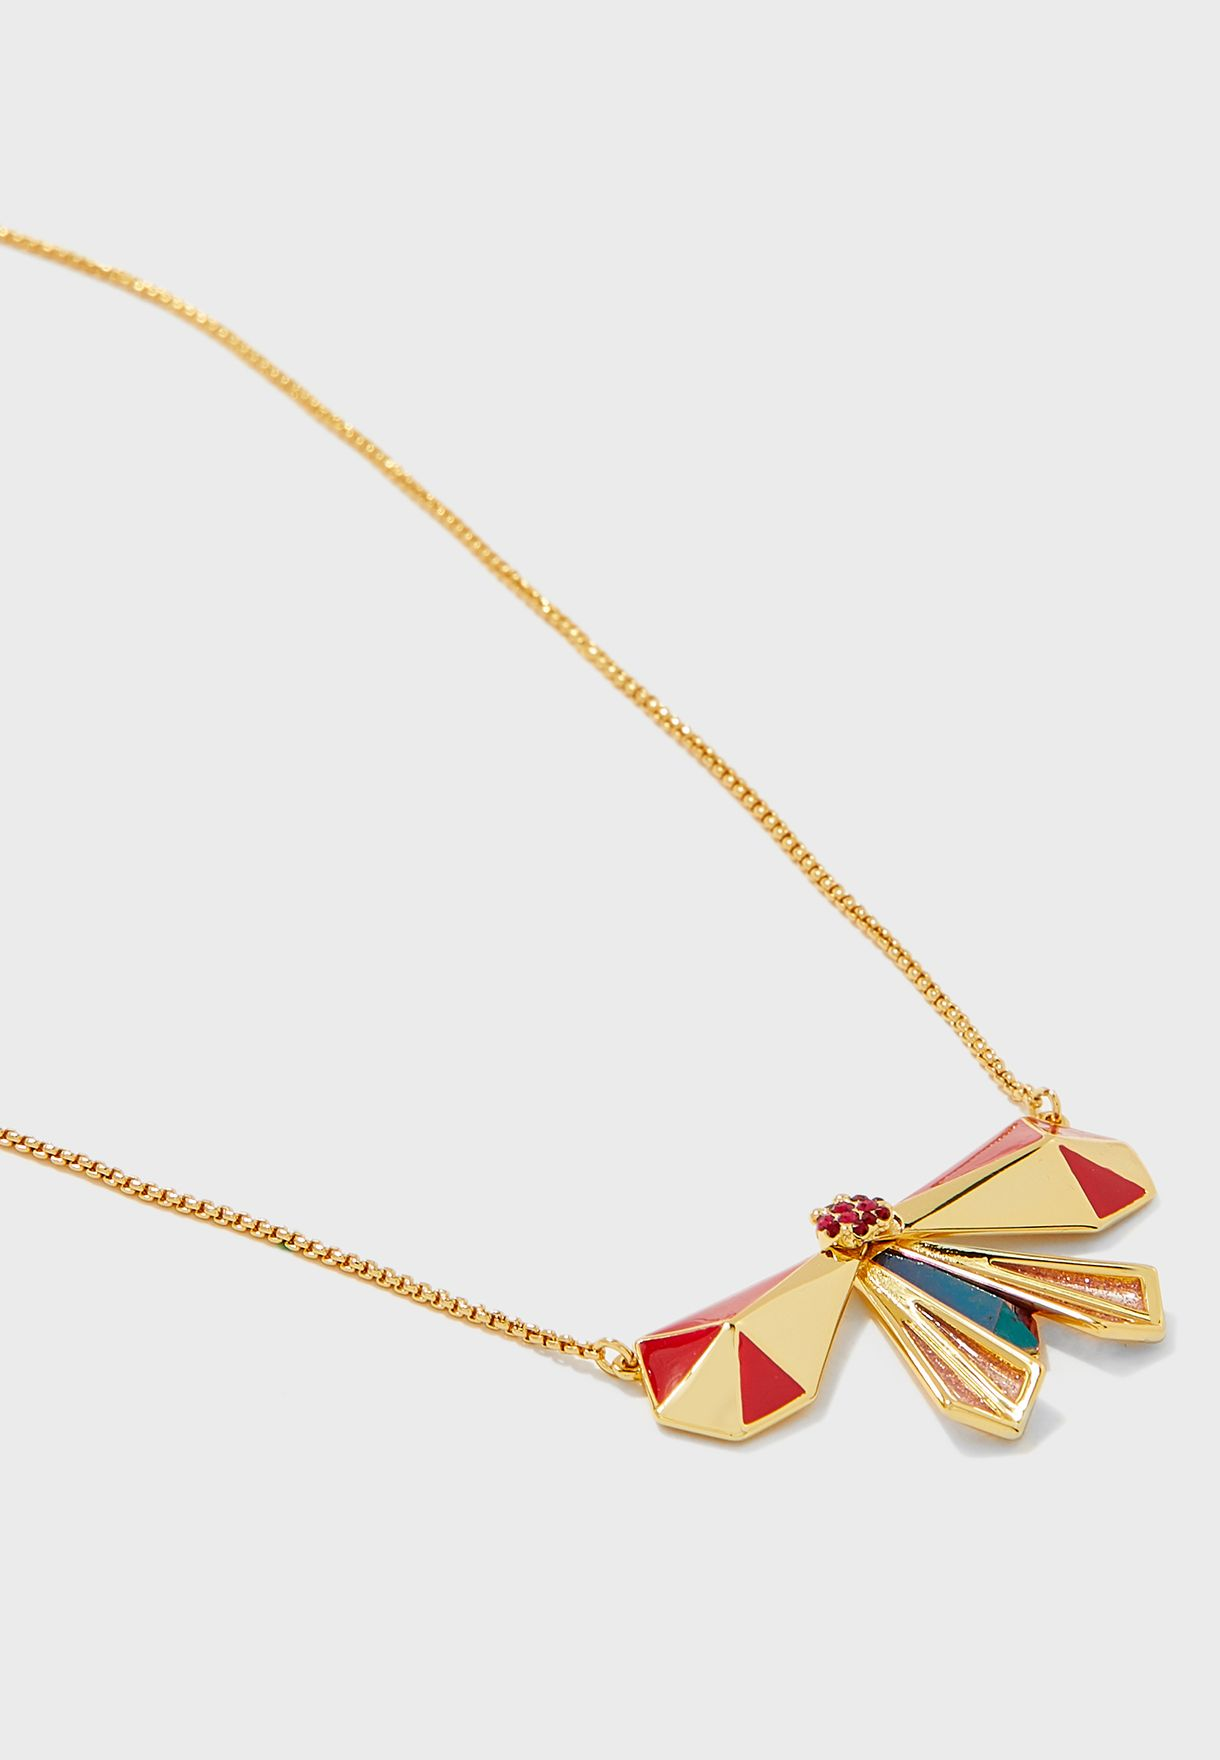 Atlas Pyramid Pendant Necklace